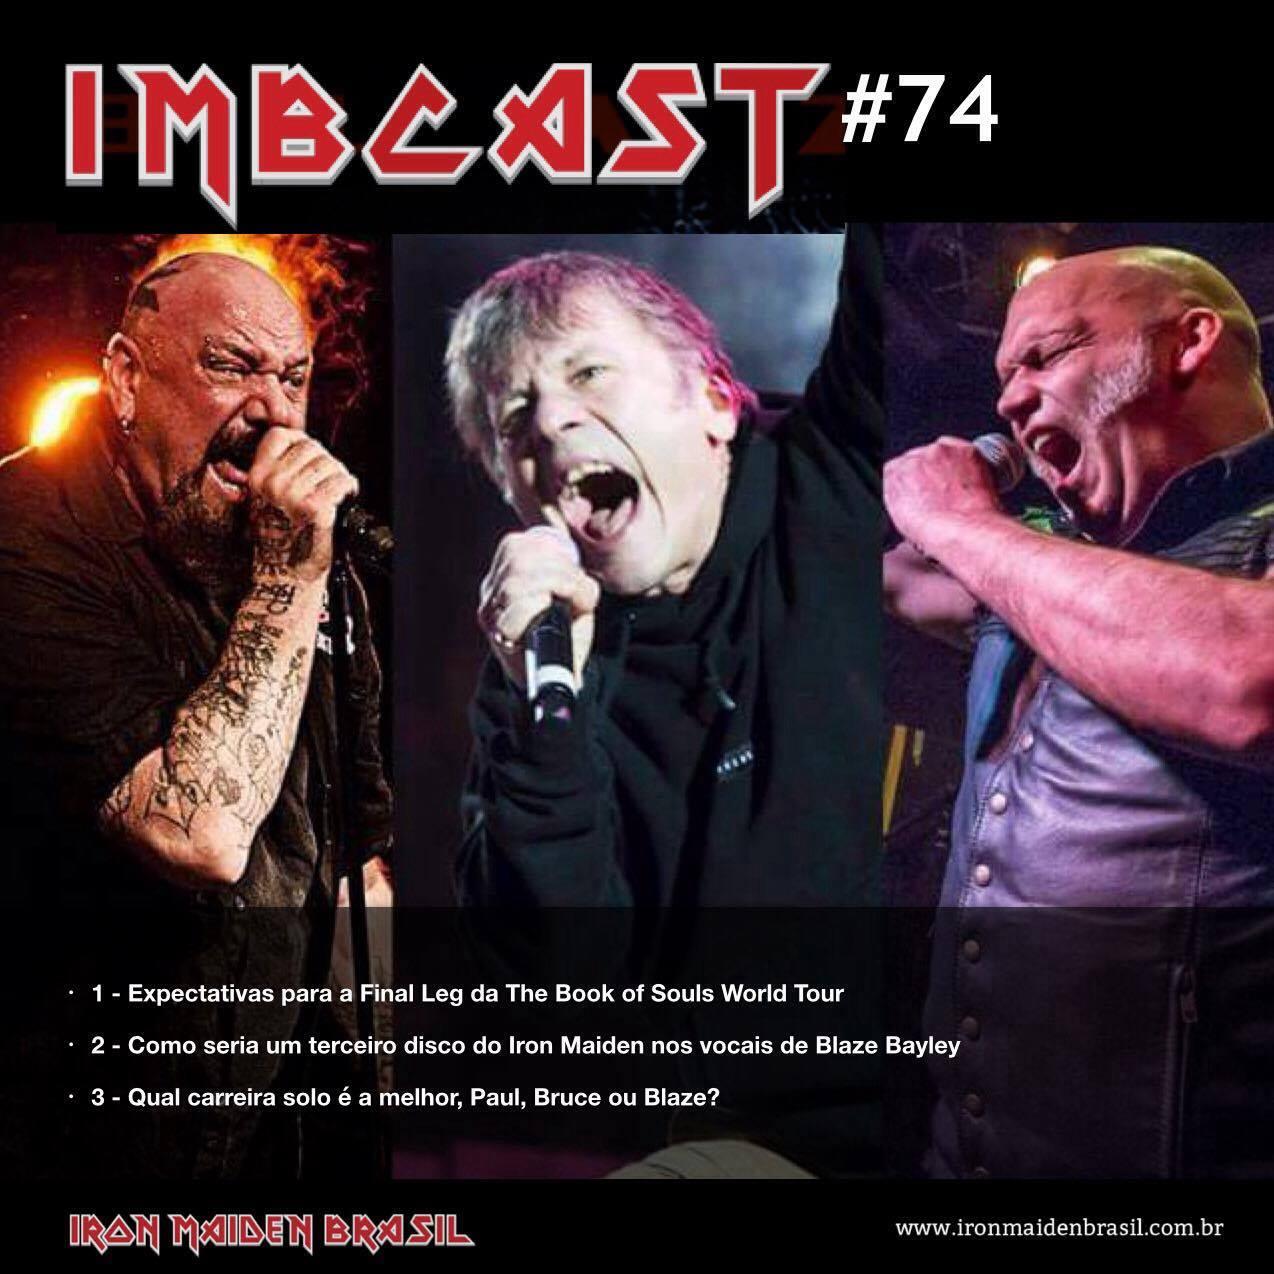 [PODCAST] - IMBCAST #74